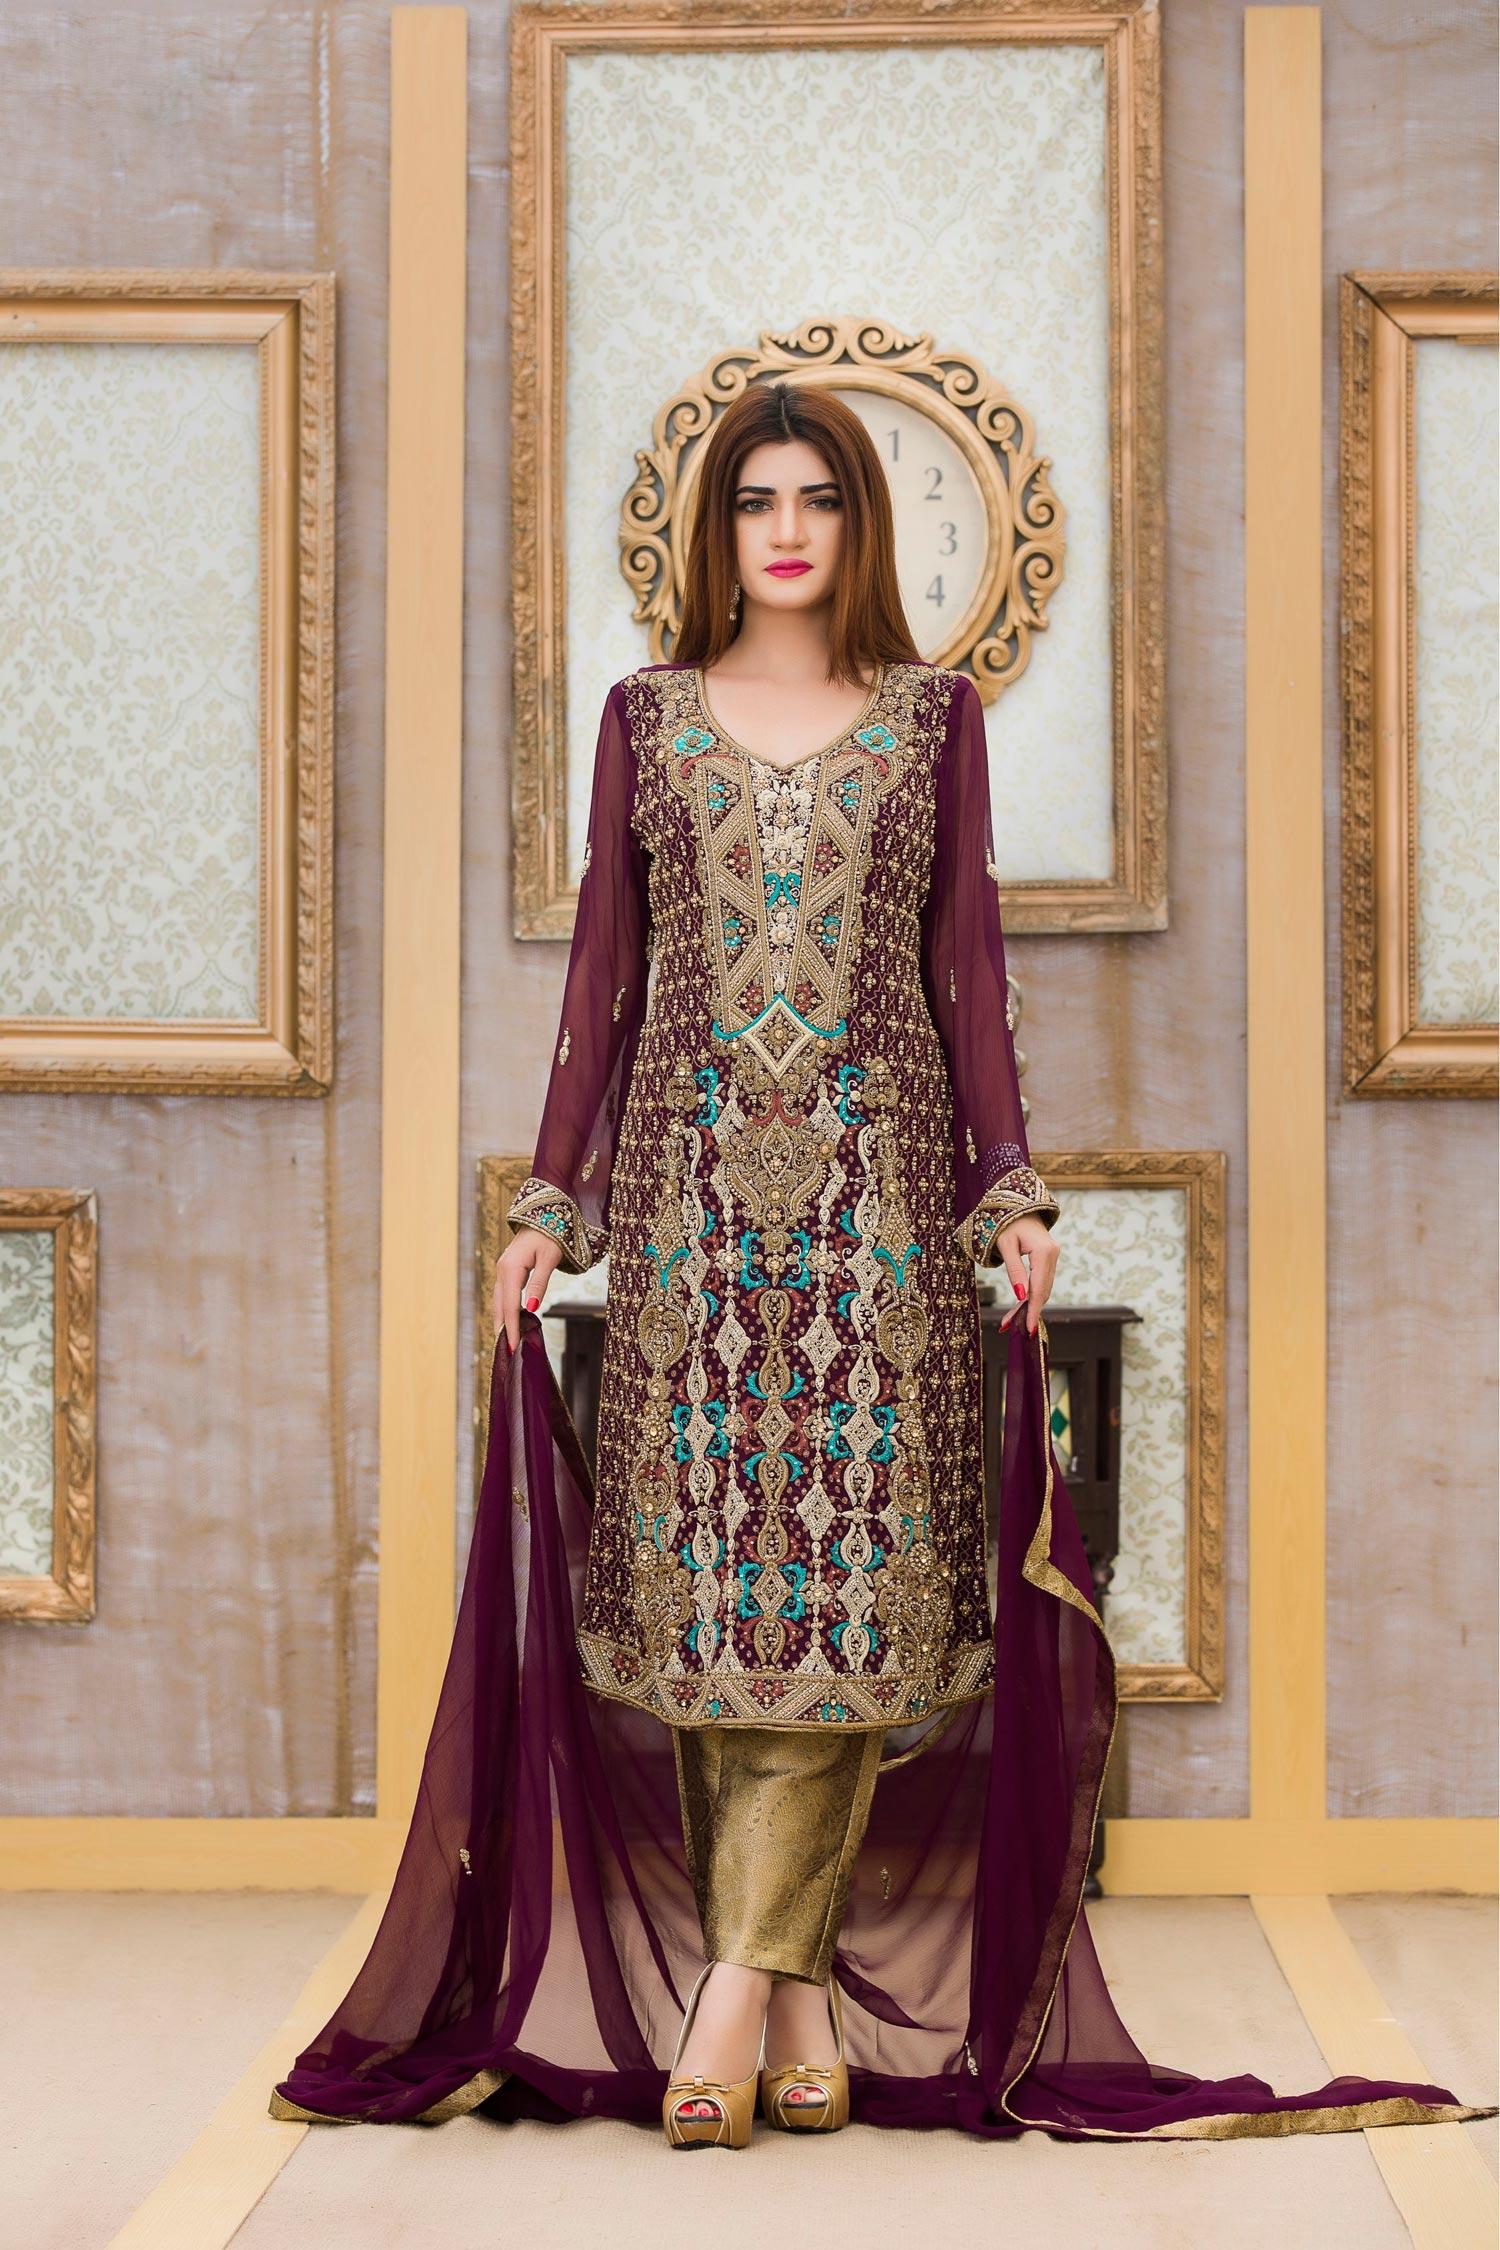 baa676df58eb Exclusive Boutique Stylish Purple Bridal Dress - Exclusive Online ...